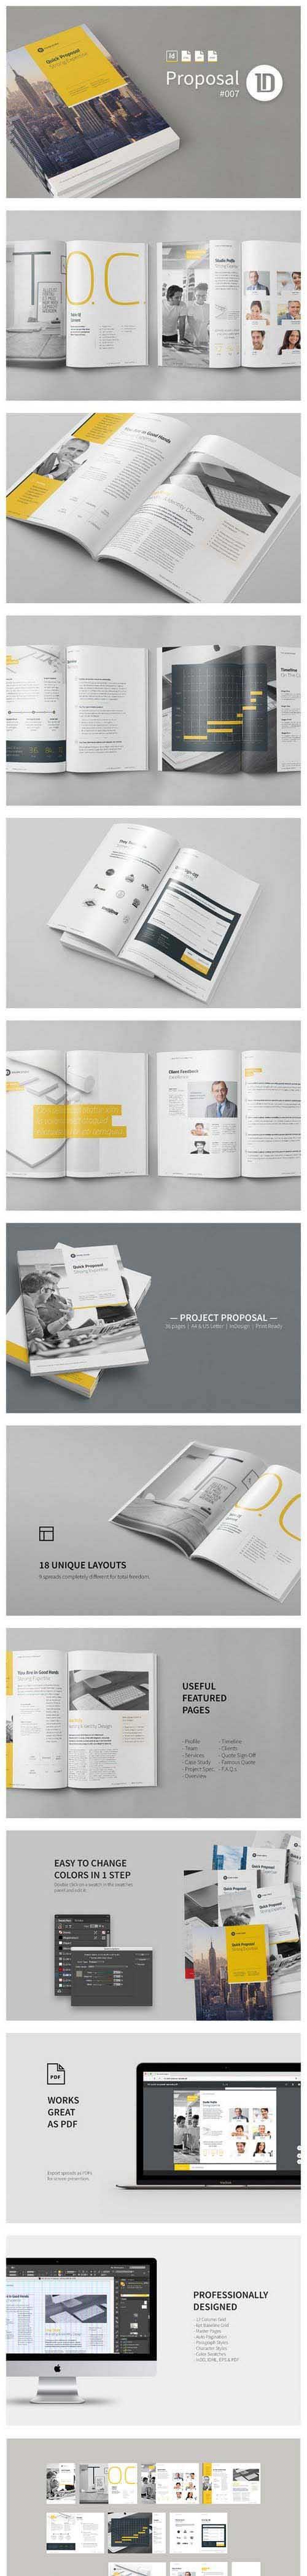 Quick Proposal 007 - The Essentials 896929